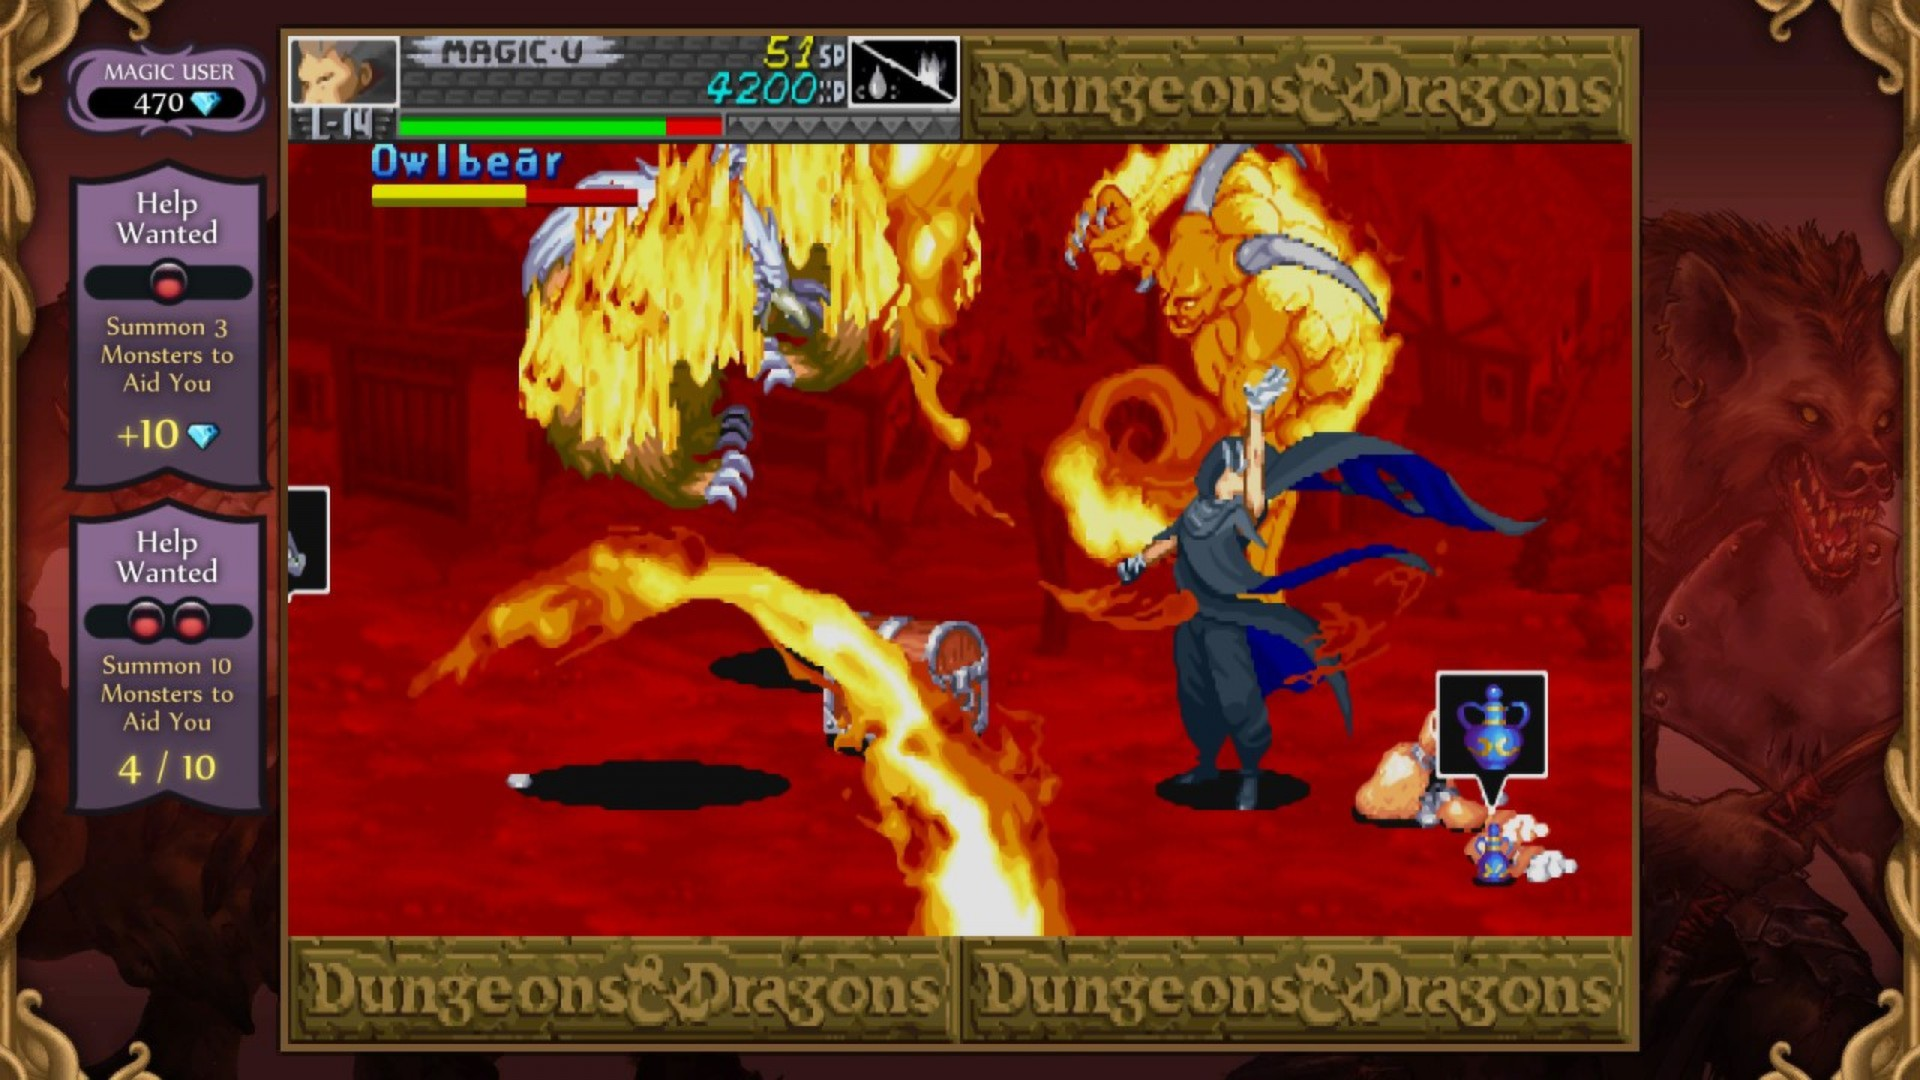 Dungeons & Dragons: Chronicles of Mystara PC Key Fiyatları